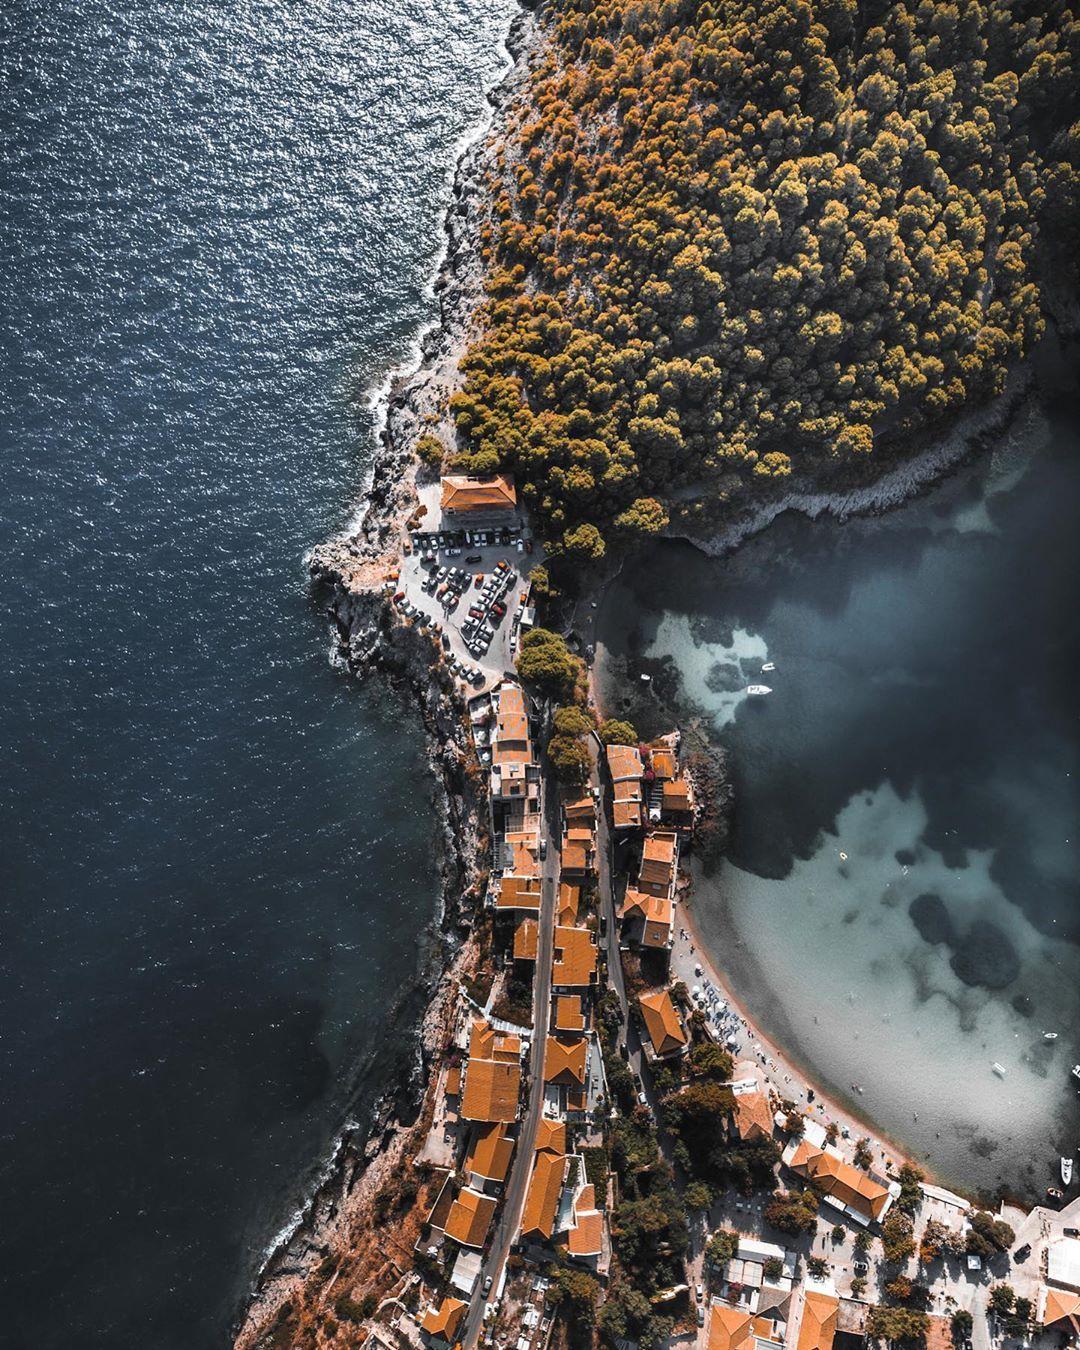 "Antrikos Koutroumanis's Instagram photo: ""• 𝘗𝘦𝘯𝘪𝘯𝘴𝘶𝘭𝘢 𝘰𝘧 𝘈𝘴𝘴𝘰𝘴 • . . .  #GreatShotz #LandScape_Photography #Jaw_Dropping_Shots #Hot_Shotz  #Global_HotShotz #Big_Shotz…"""